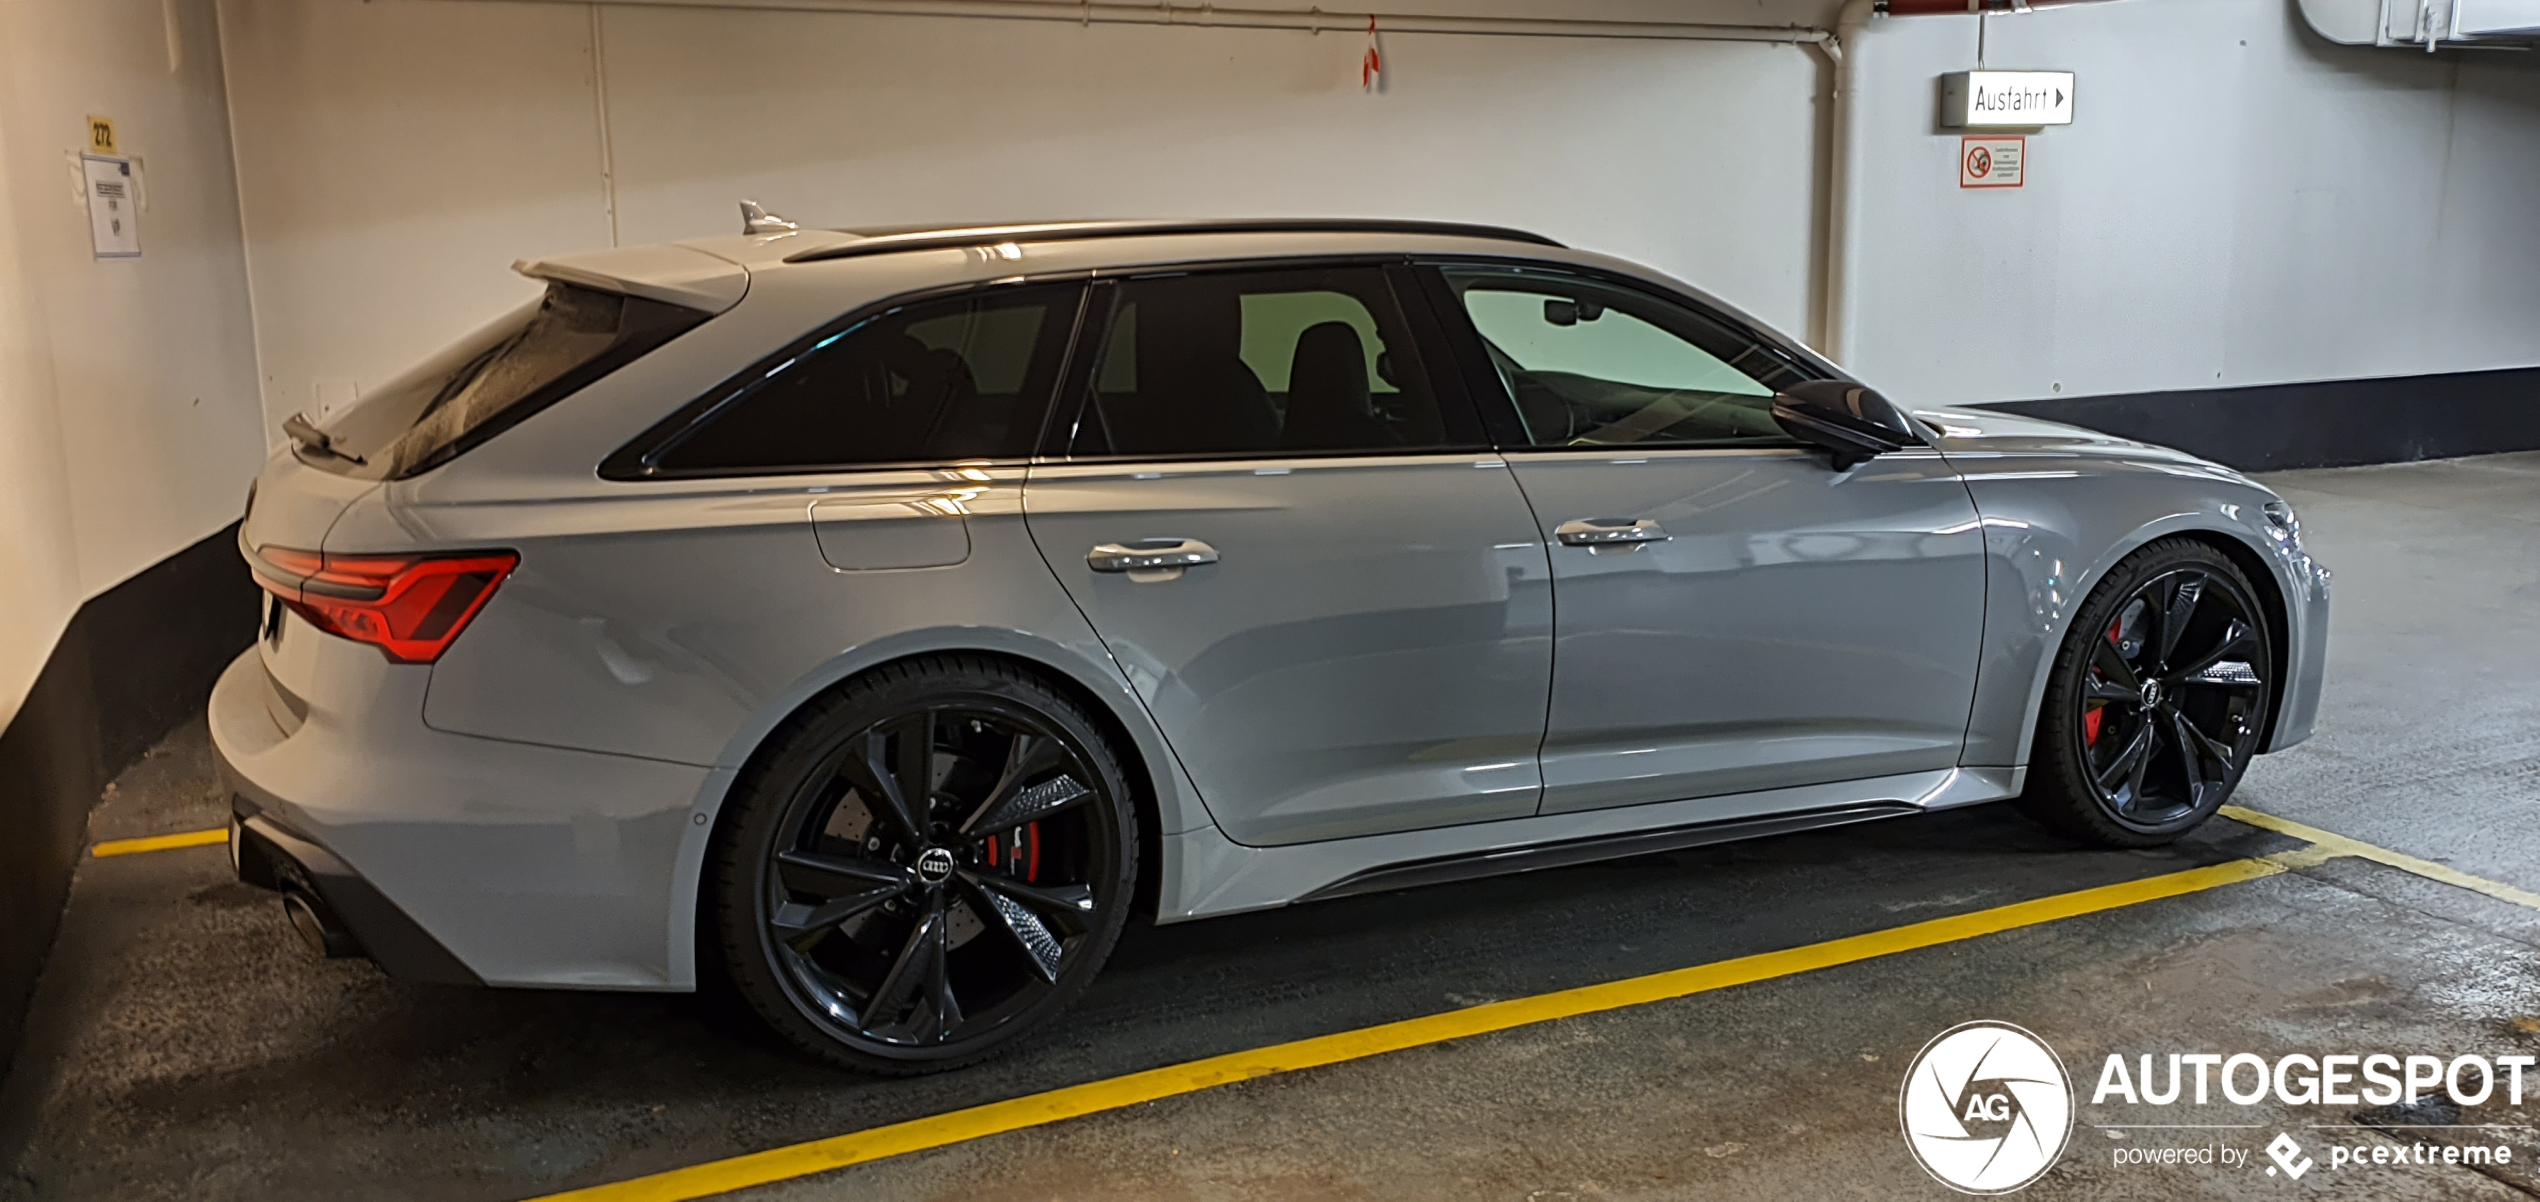 Audi RS6 Avant C8 - 29 May 2020 - Autogespot